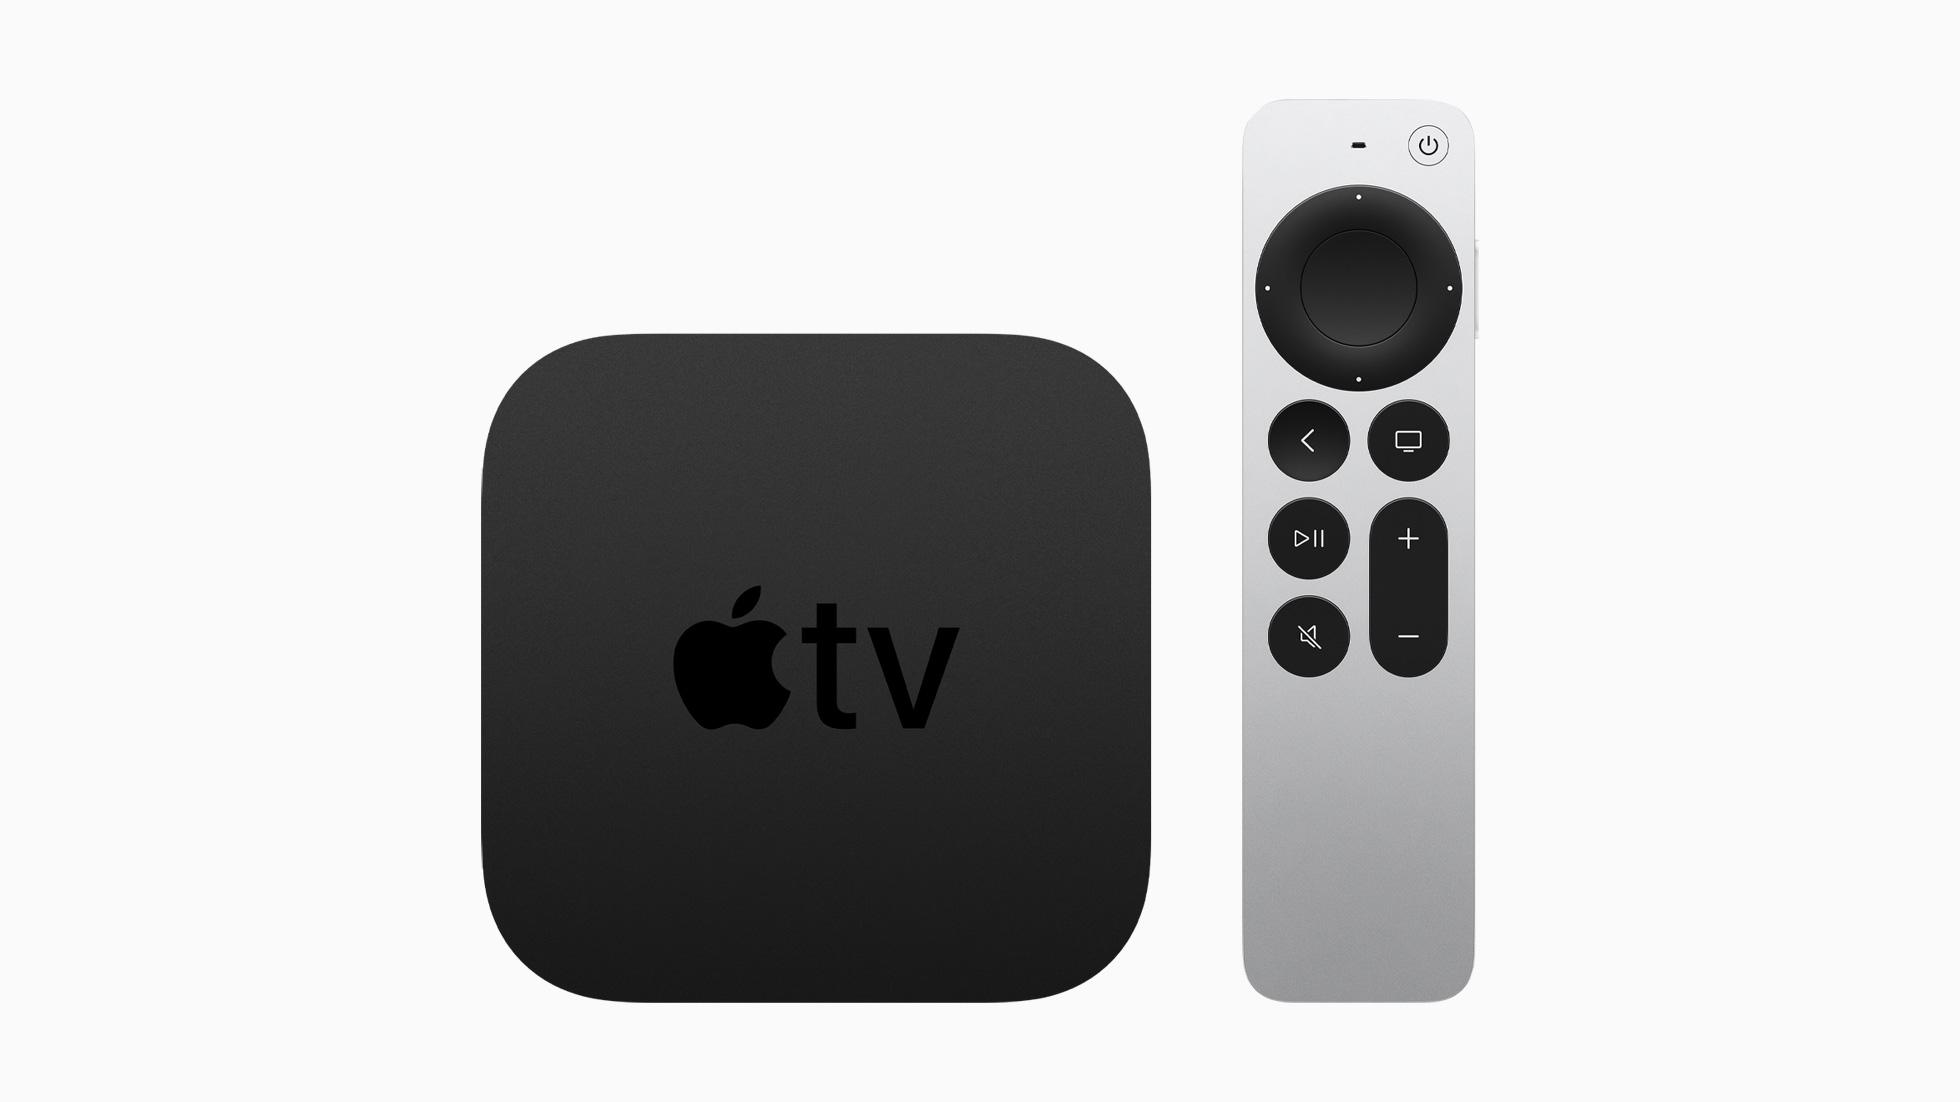 Apple TV 4K April 20 release